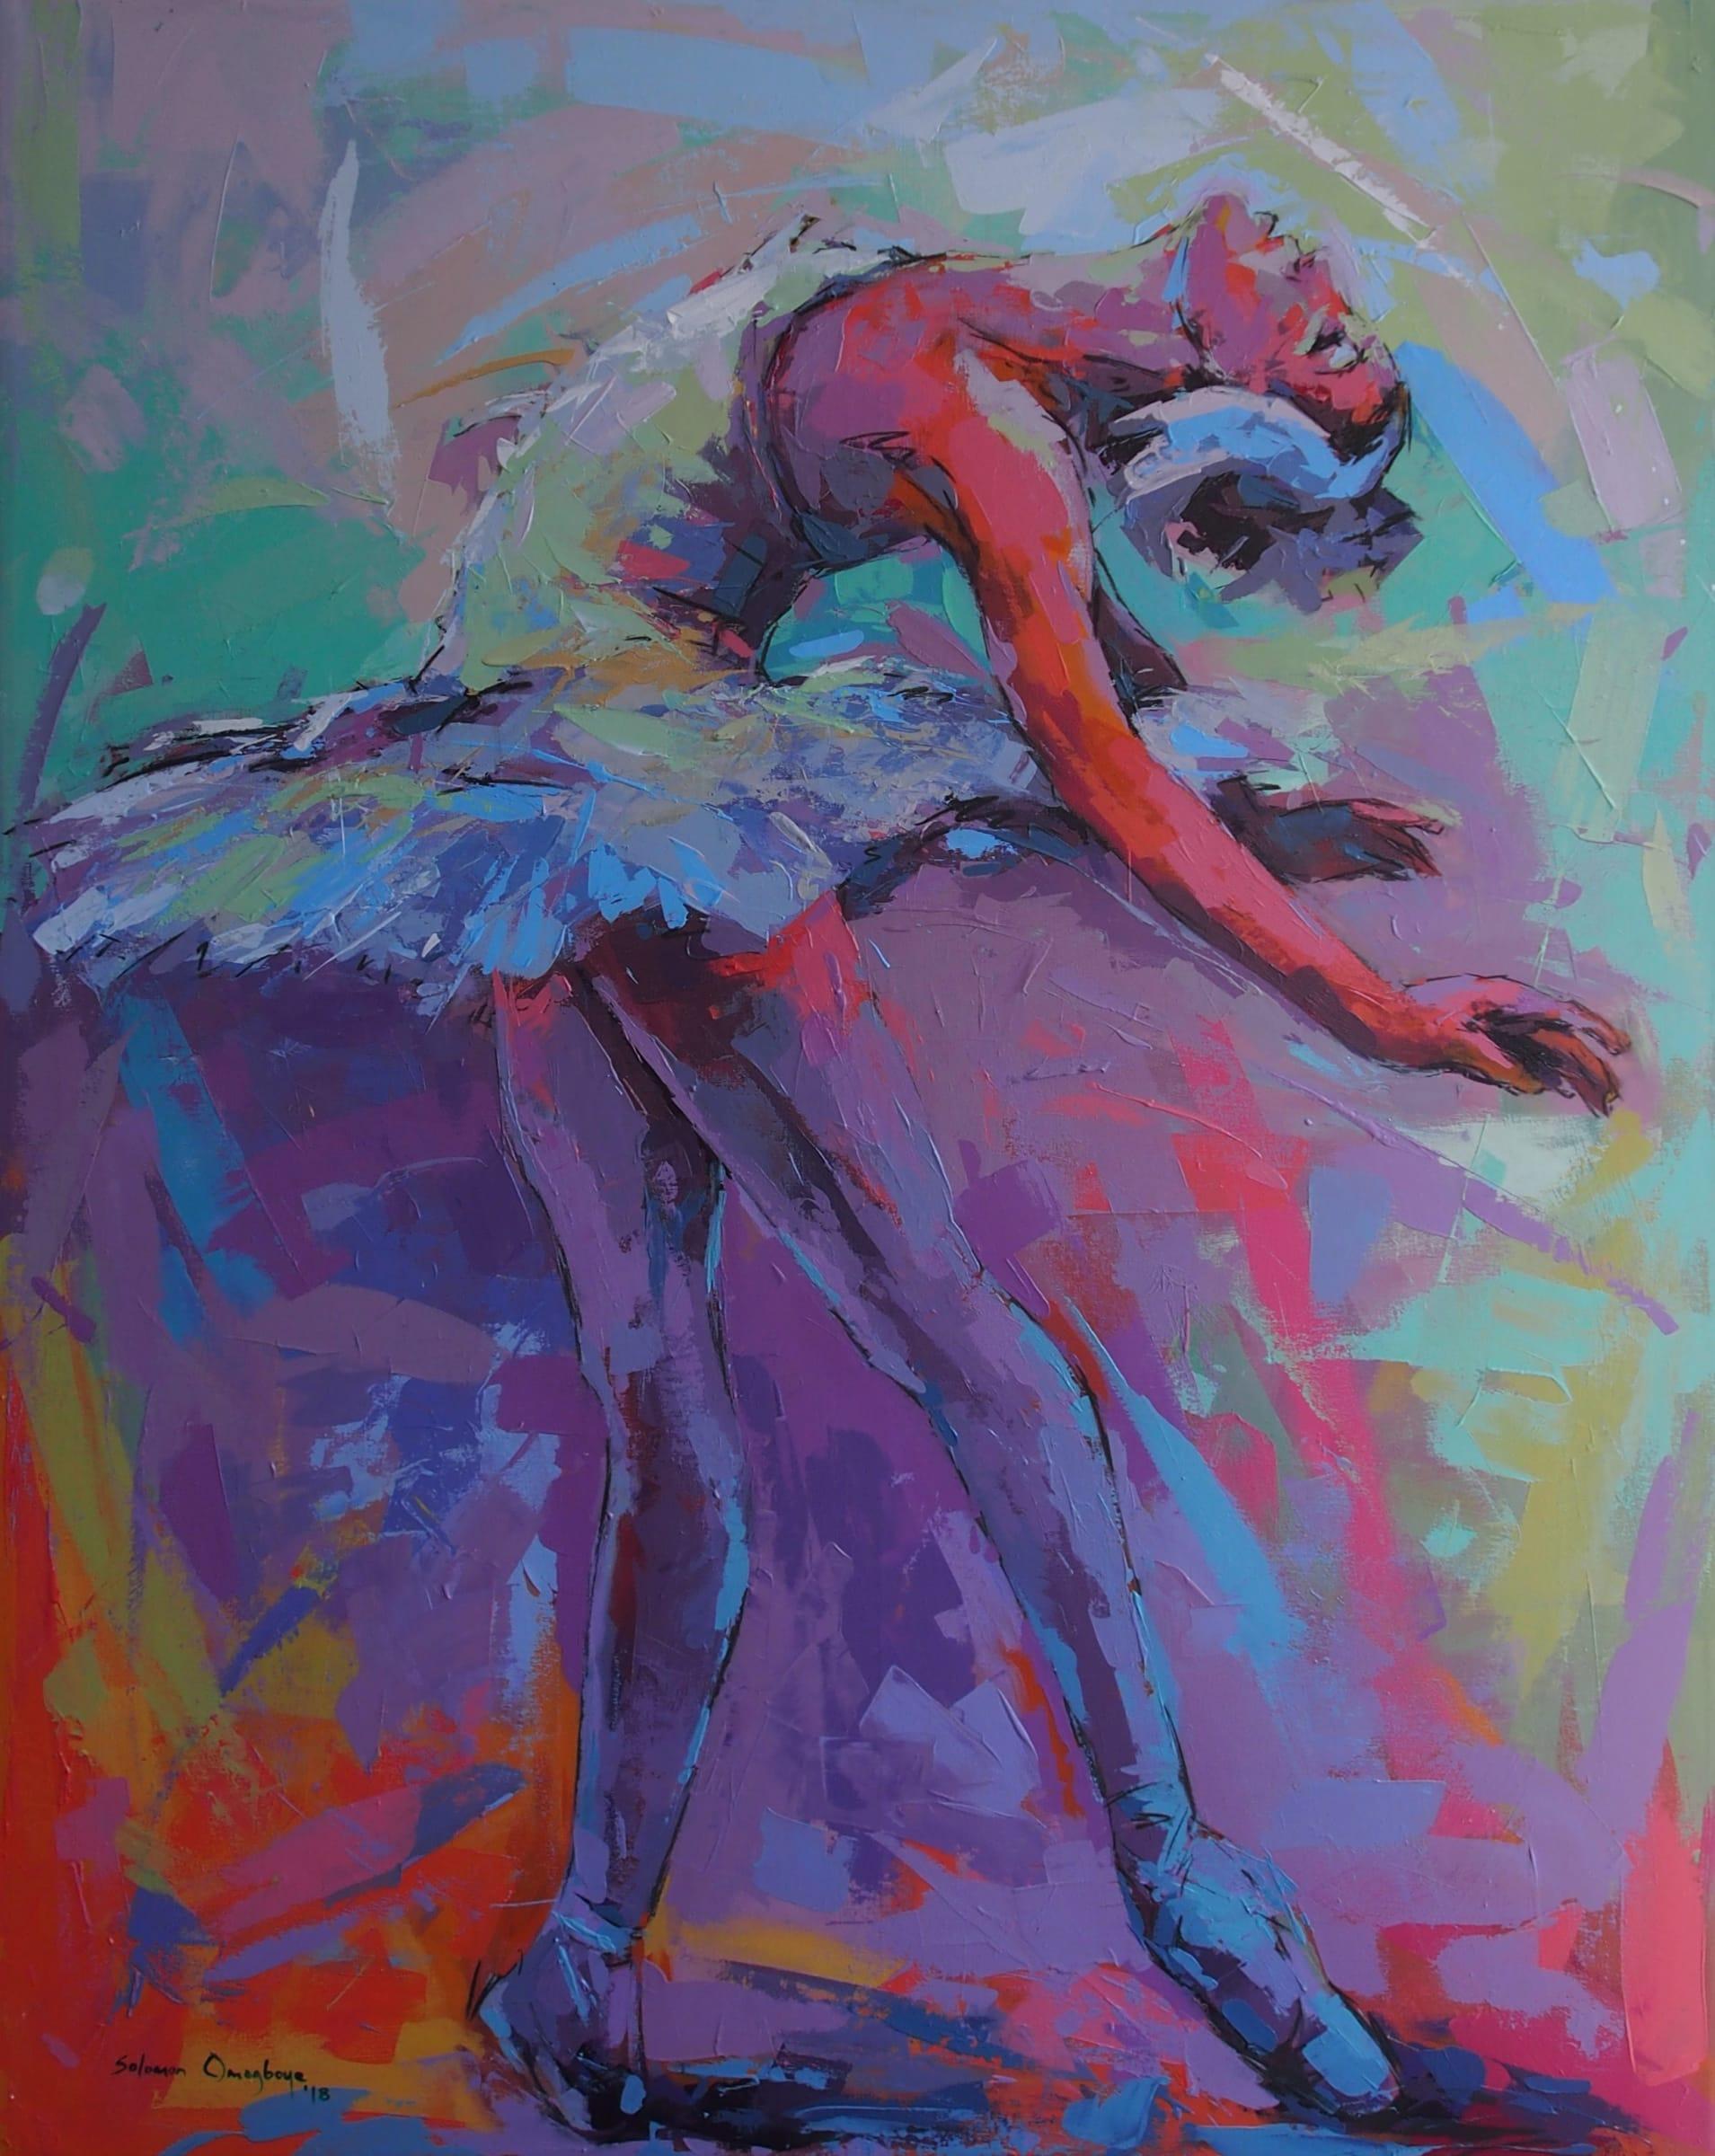 <span class=&#34;link fancybox-details-link&#34;><a href=&#34;/artists/39-solomon-omogboye/works/2019-solomon-omogboye-embrace-your-passion-ballerina-2018/&#34;>View Detail Page</a></span><div class=&#34;artist&#34;><strong>Solomon Omogboye</strong></div> <div class=&#34;title&#34;><em>Embrace Your Passion (Ballerina)</em>, 2018</div> <div class=&#34;medium&#34;>Acrylic On Canvas</div> <div class=&#34;dimensions&#34;>120cm x 150.5cm</div>